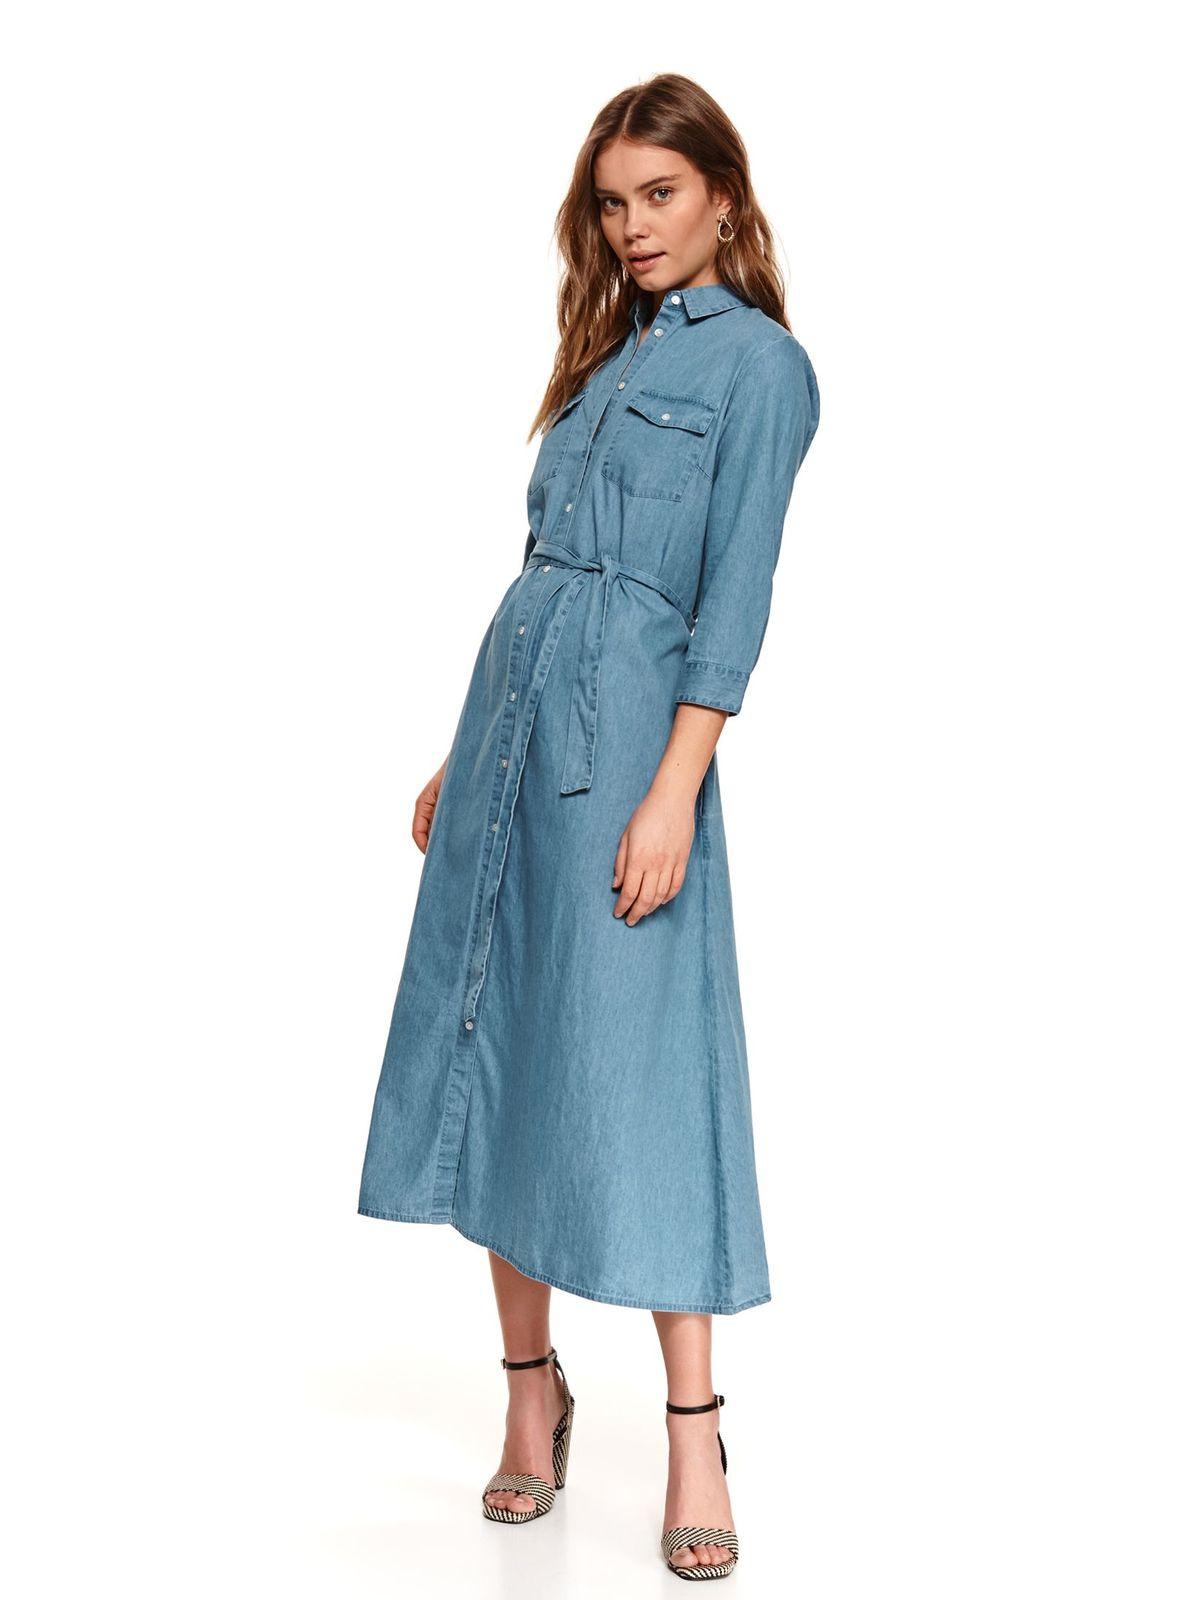 Kék midi galléros ruha harang tipusú